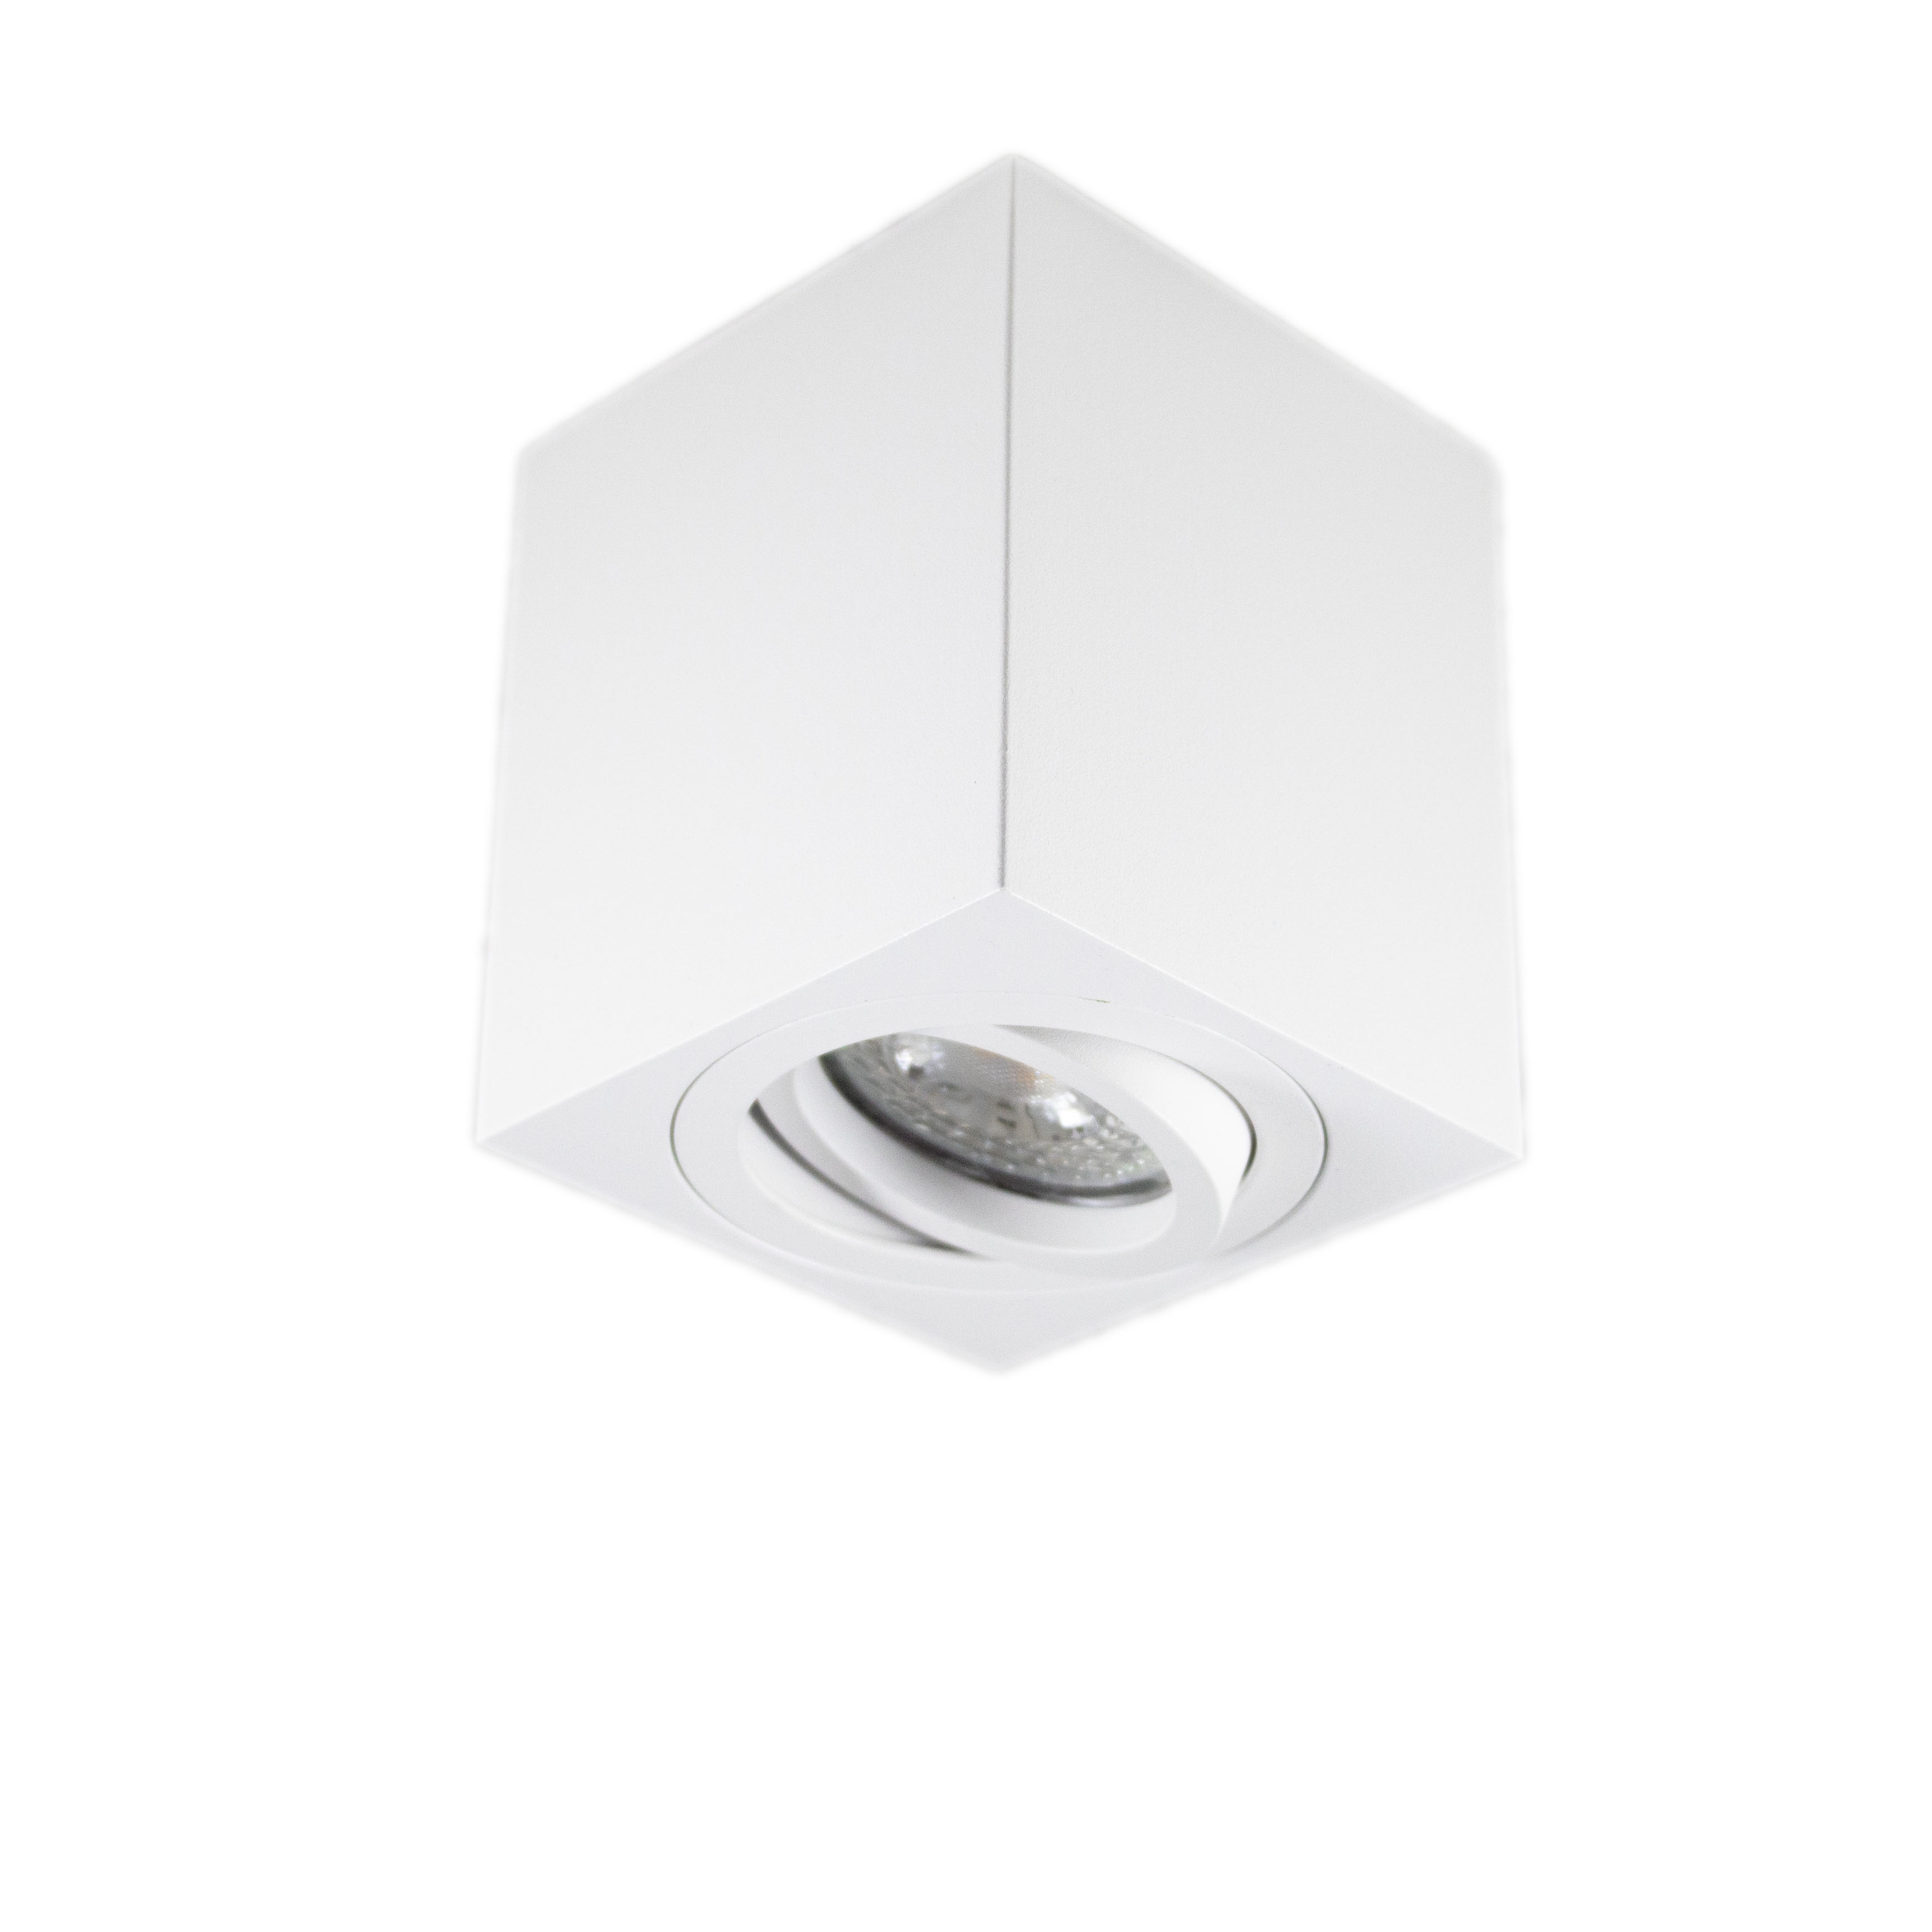 Opbouw spot armatuur wit vierkant kantelbaar GU10 fitting - spot uit gekanteld